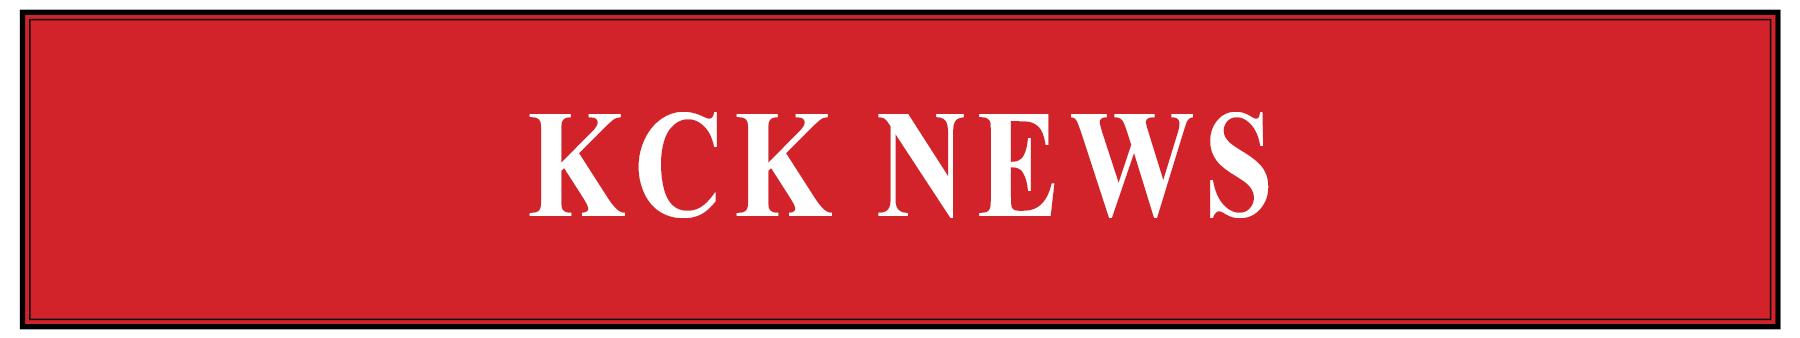 KCK News header